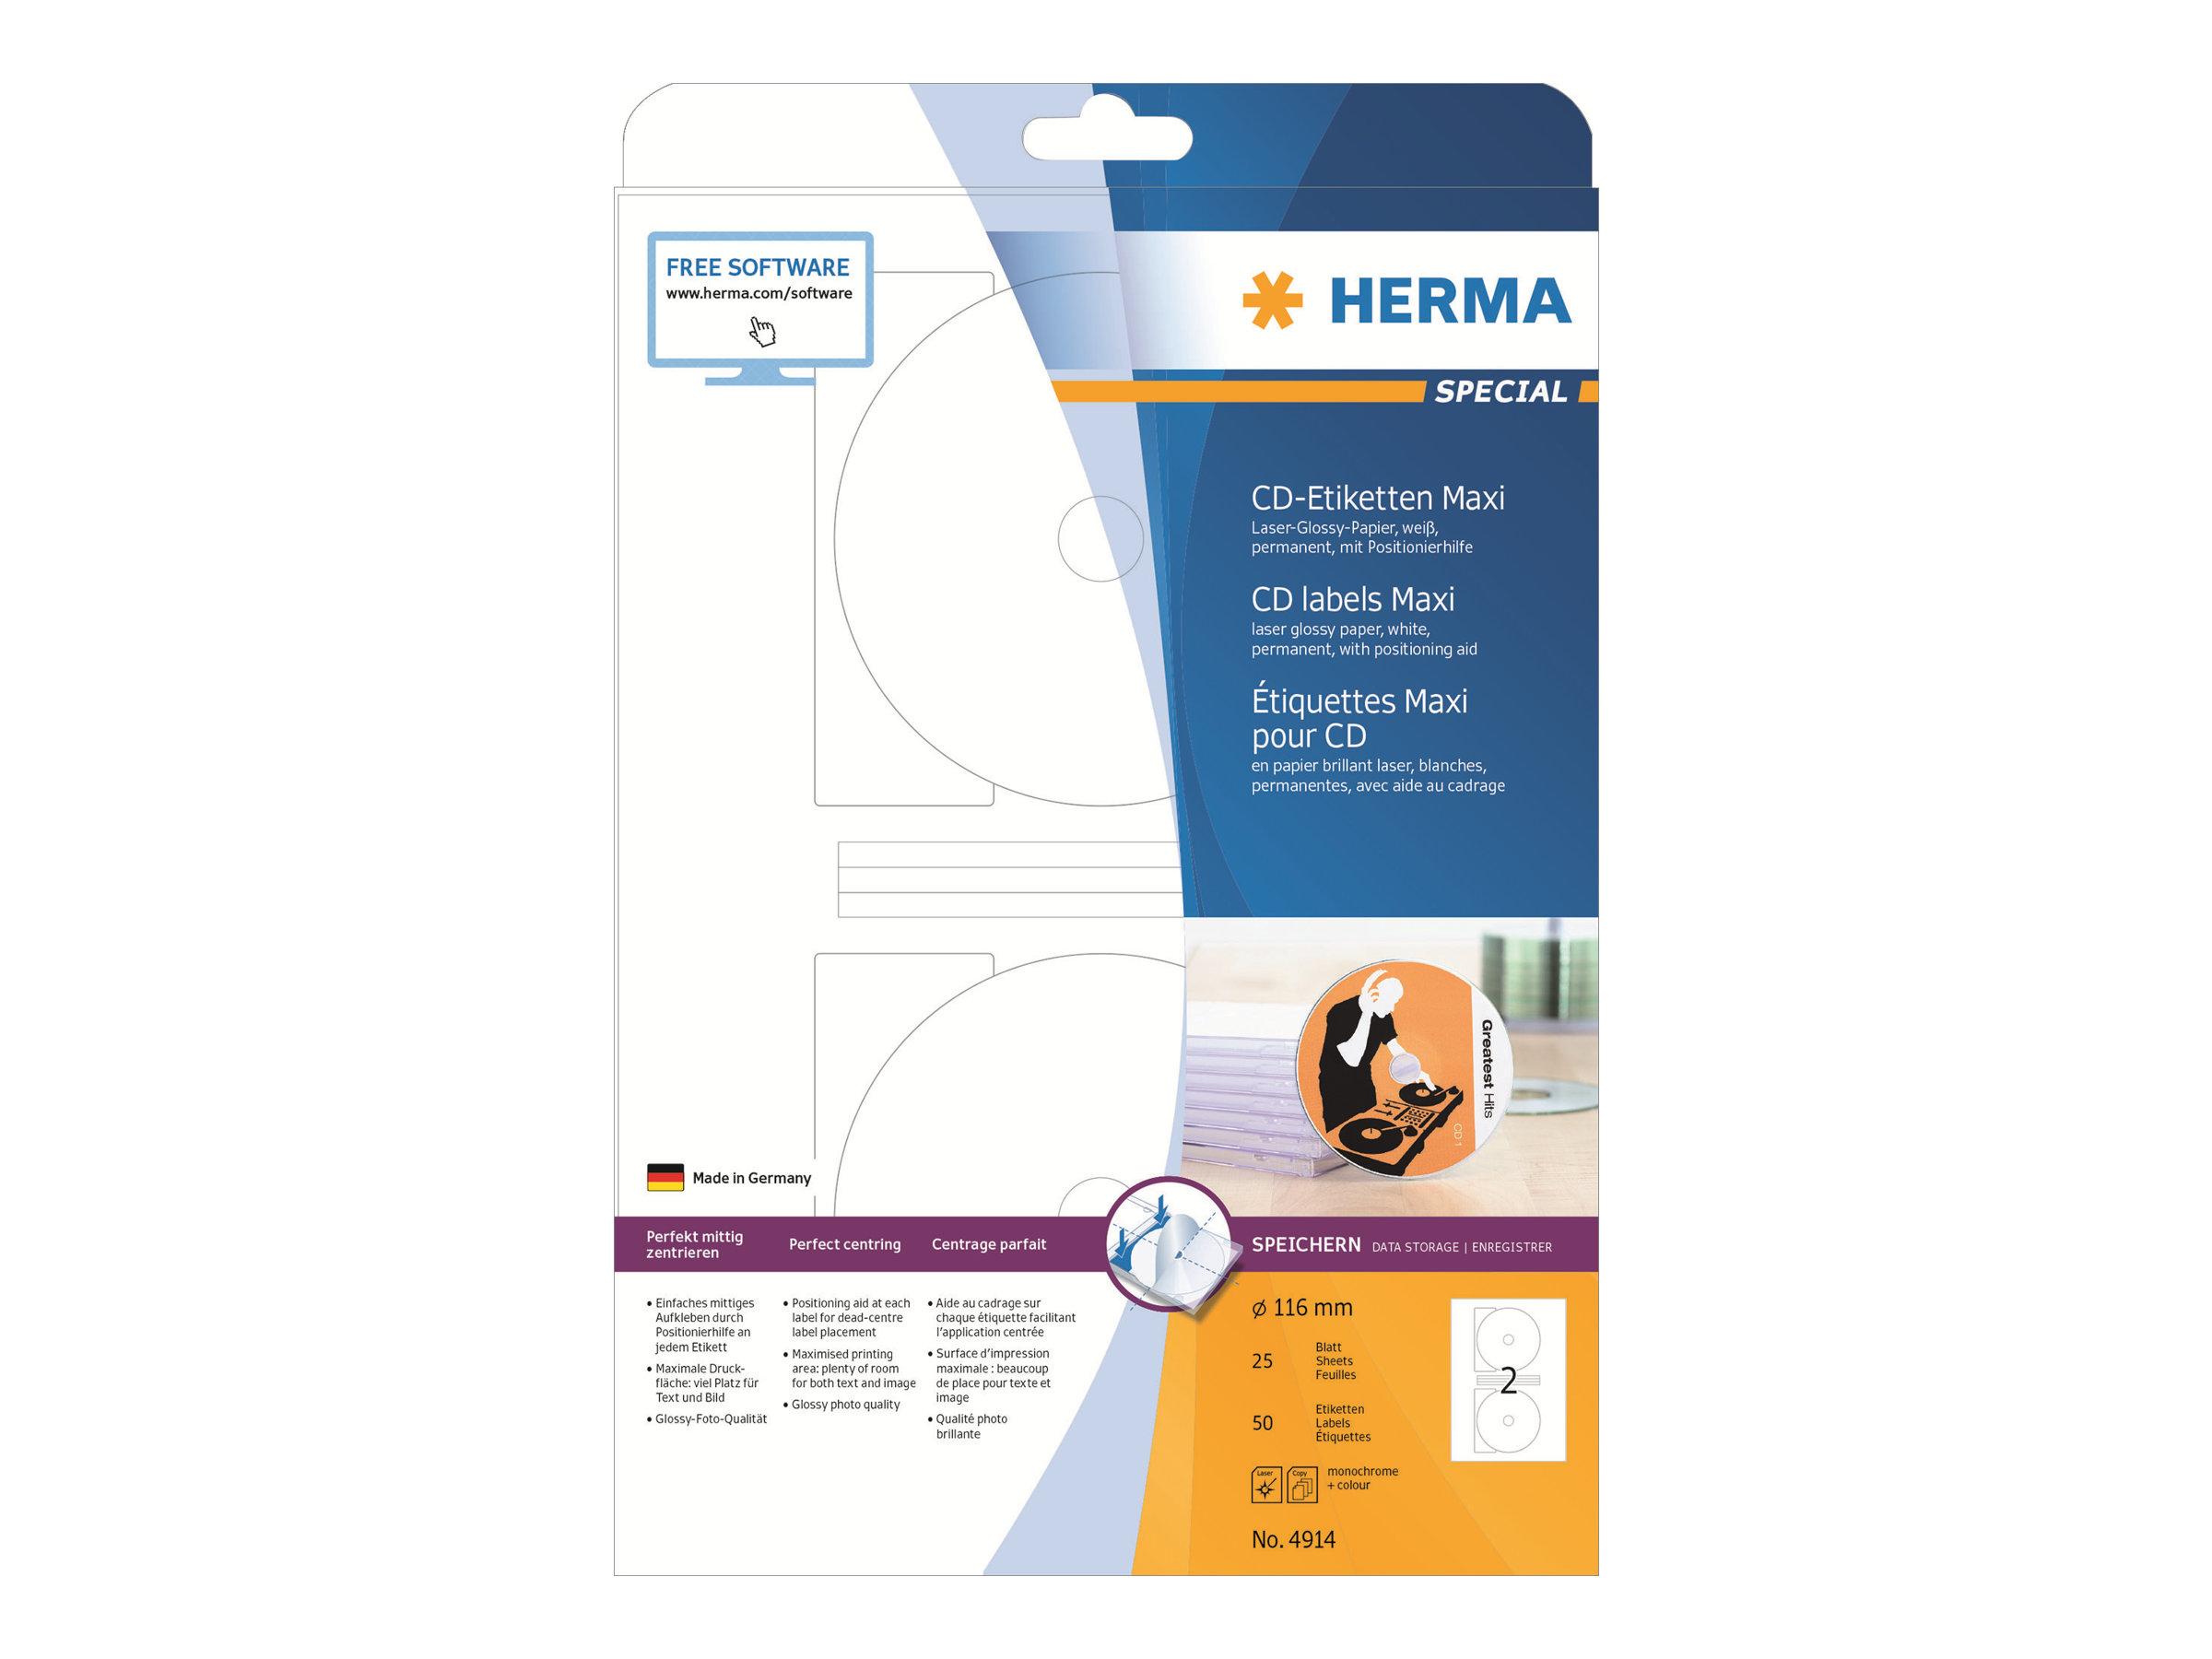 HERMA Special Maxi - Papier - hochglänzend